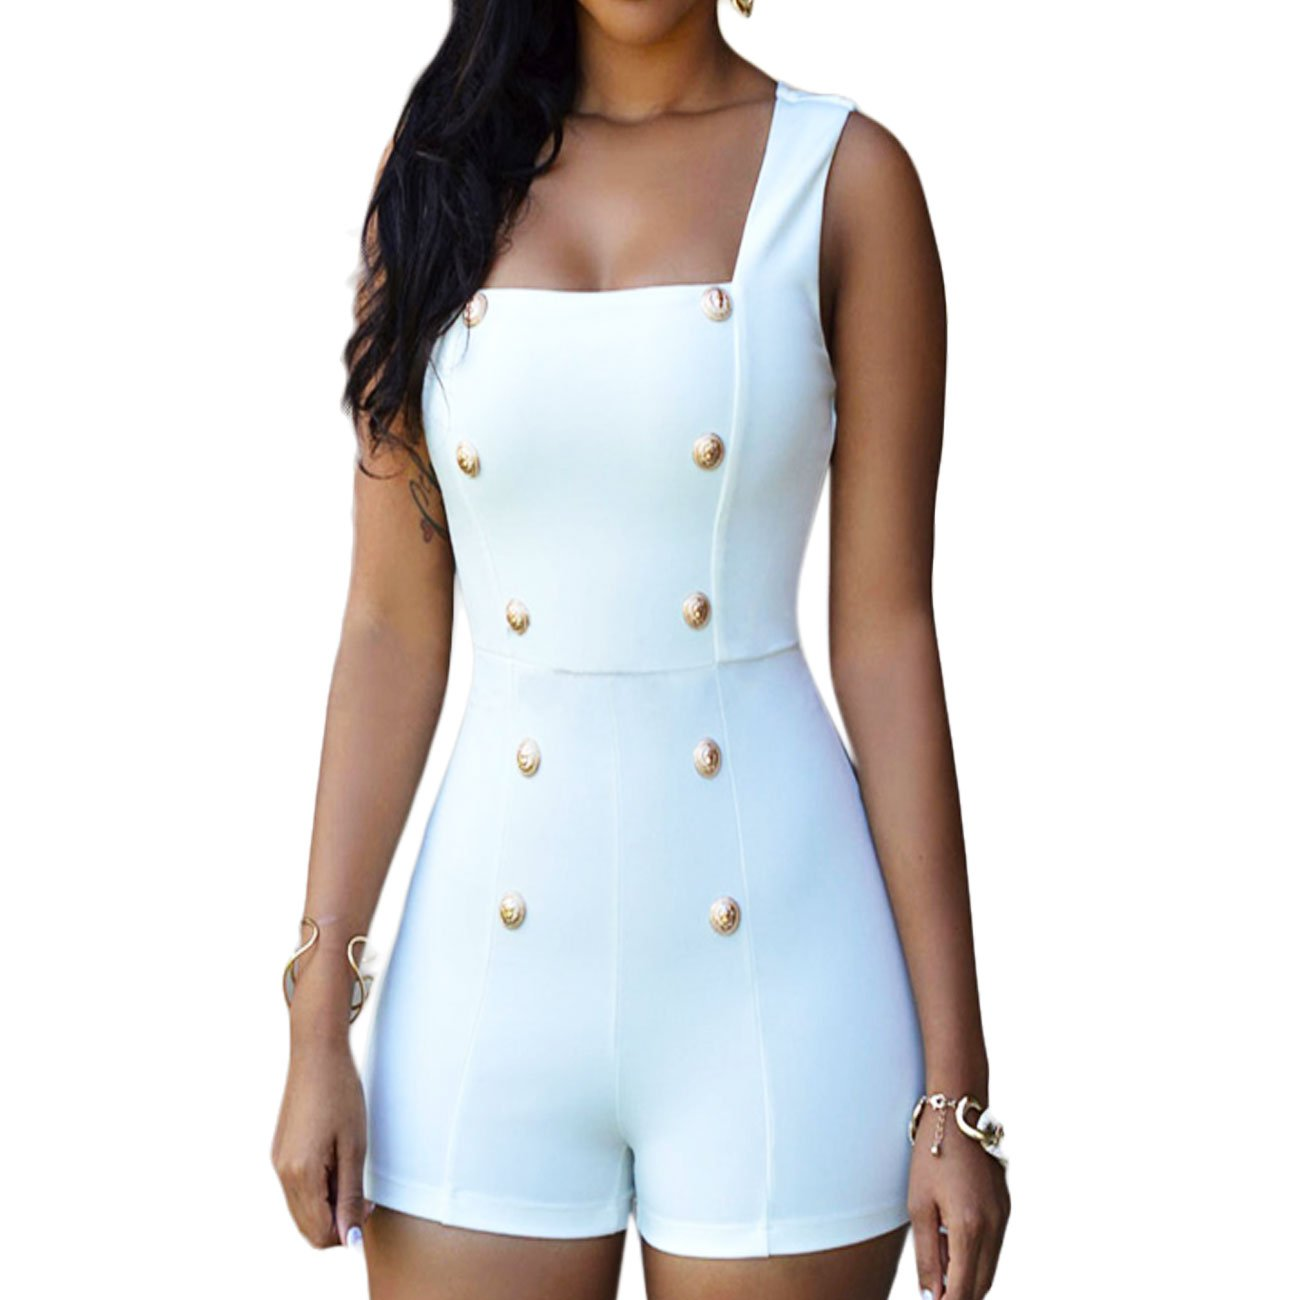 Overall donna pantaloncino shorts bottoni strass tutina intera nuovo DL-1807